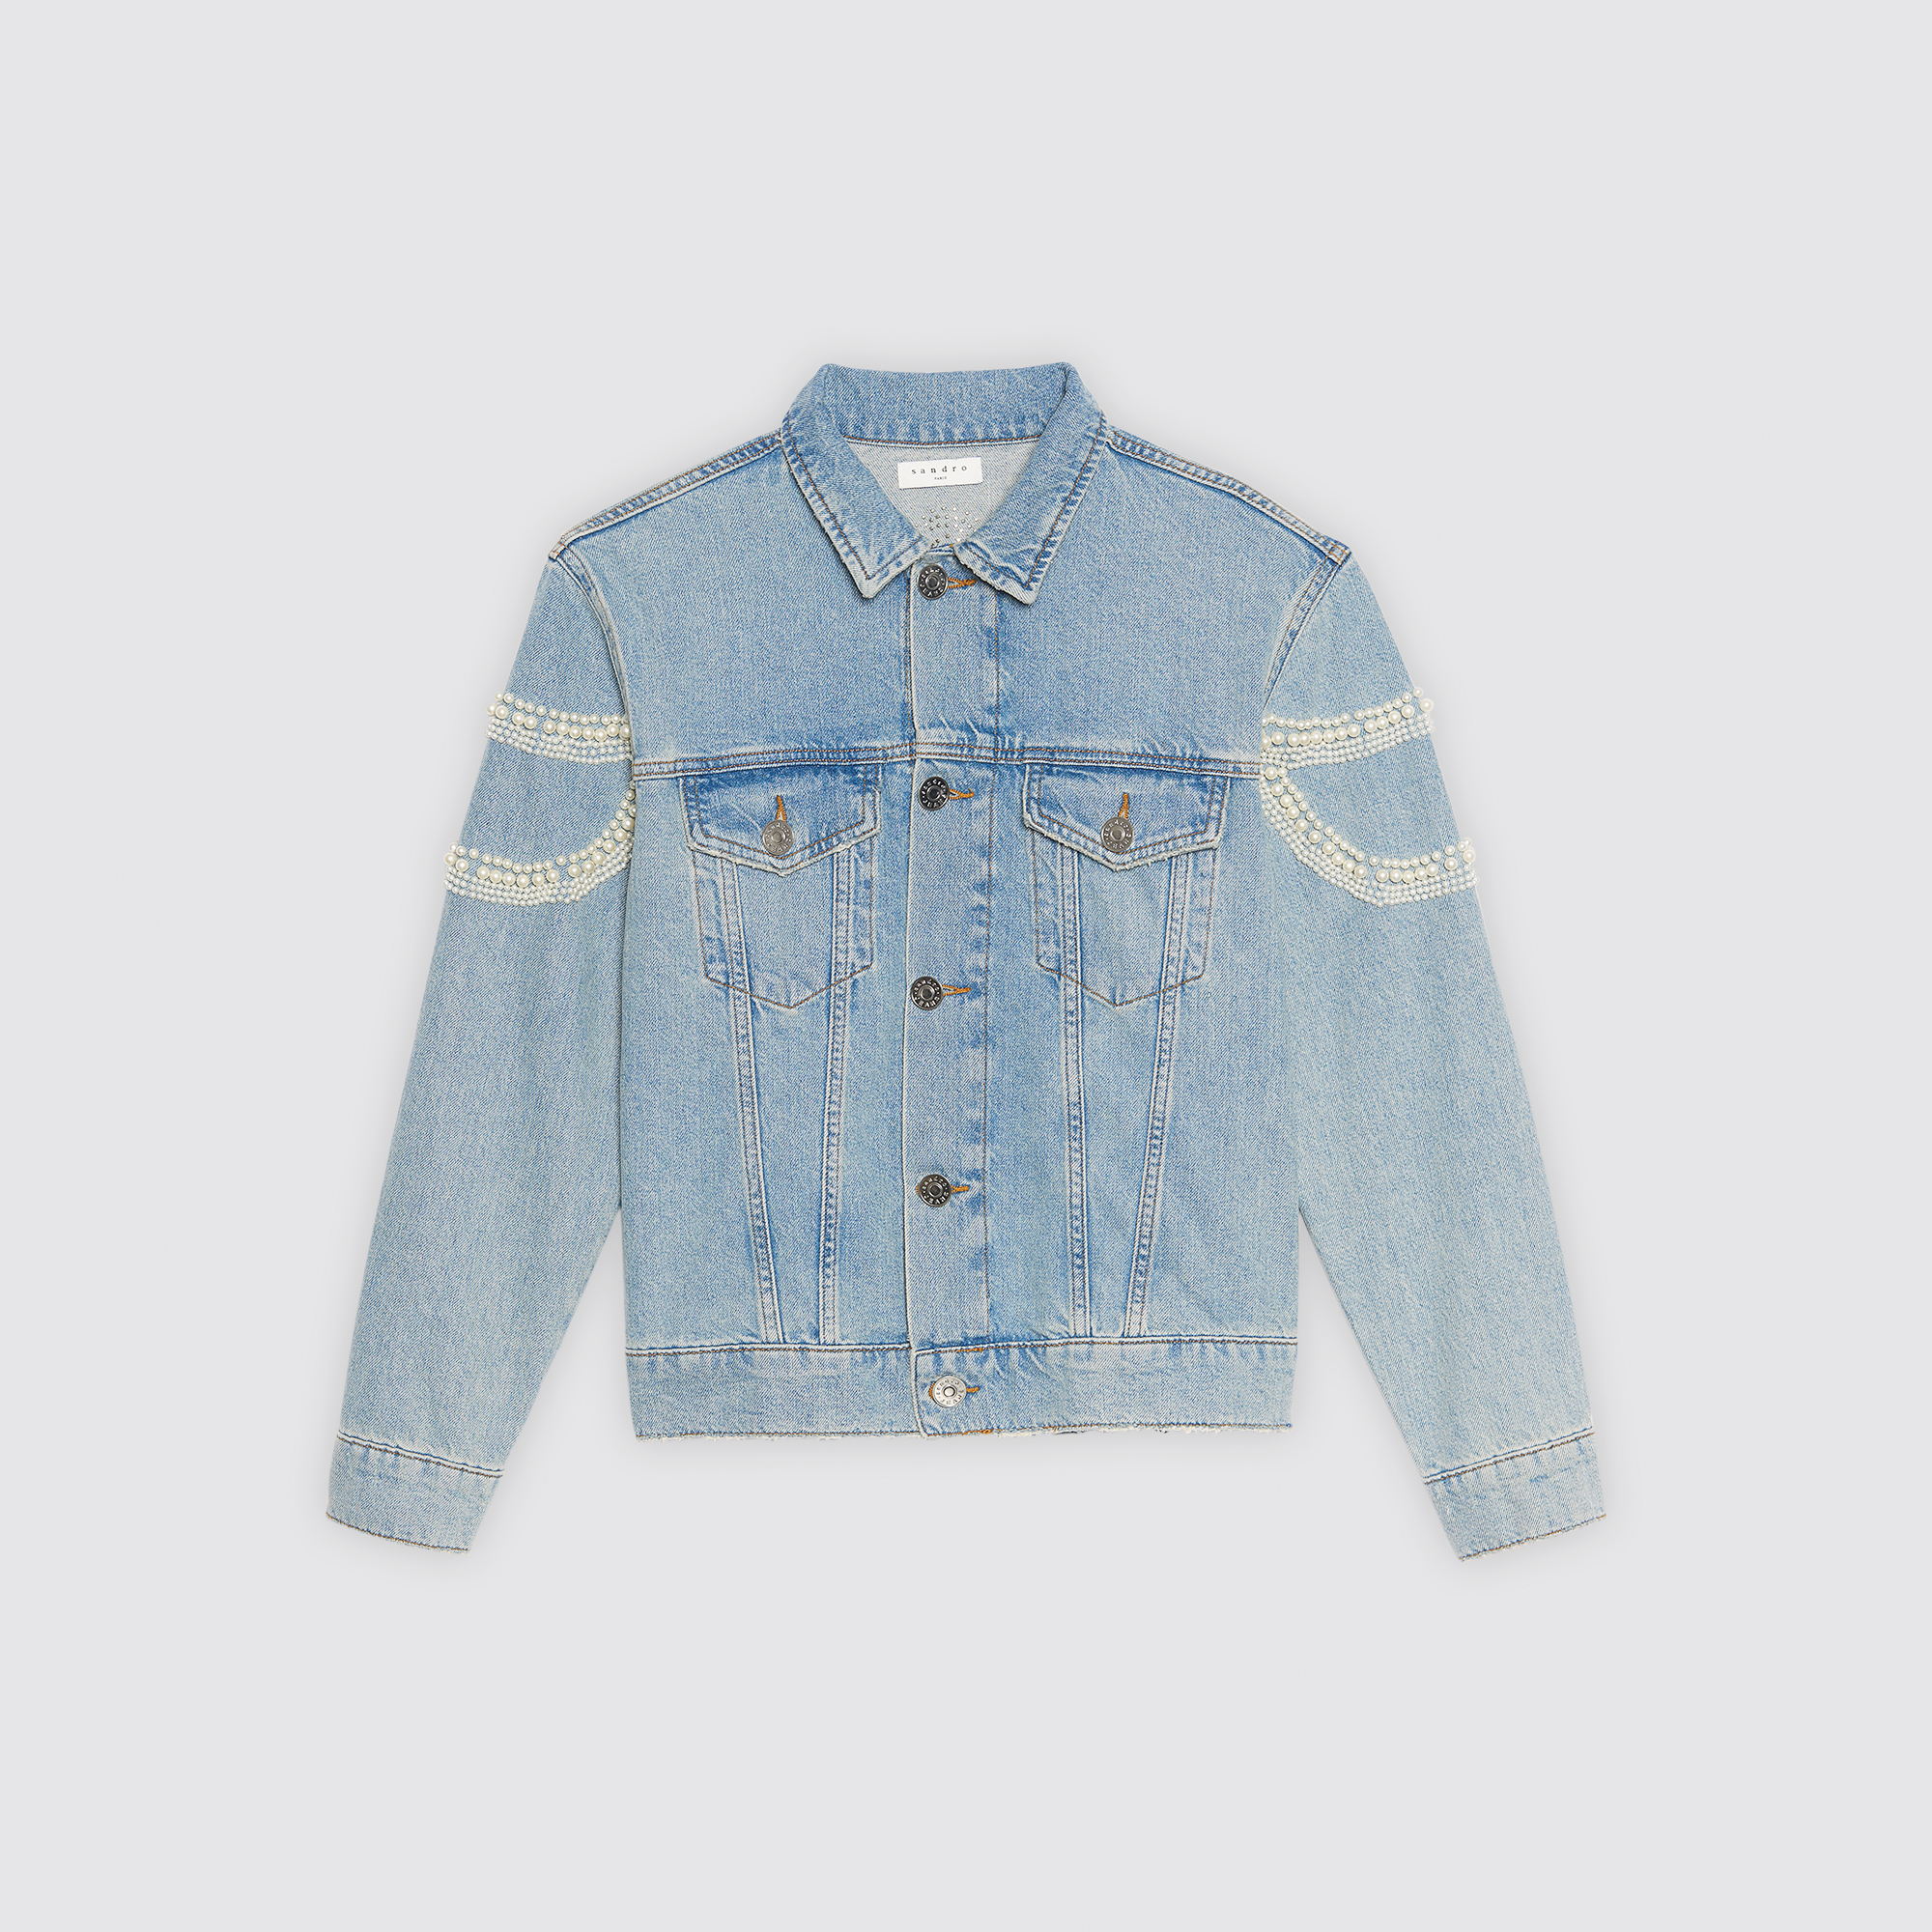 Giacca in jeans oversize con perle : Giacche & Giubbotti colore Blue Vintage - Denim